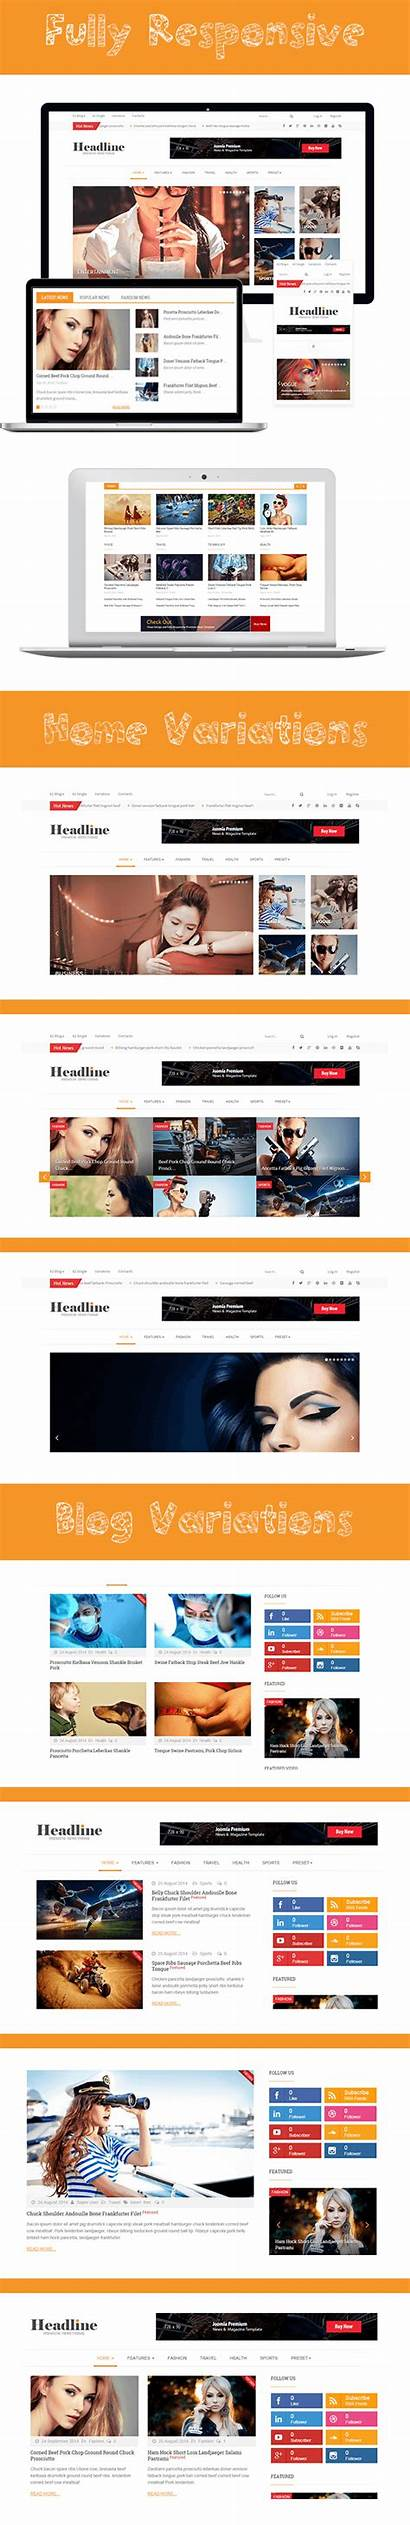 Magazine Headline Joomla Magazines Responsive Headlines Themeforest